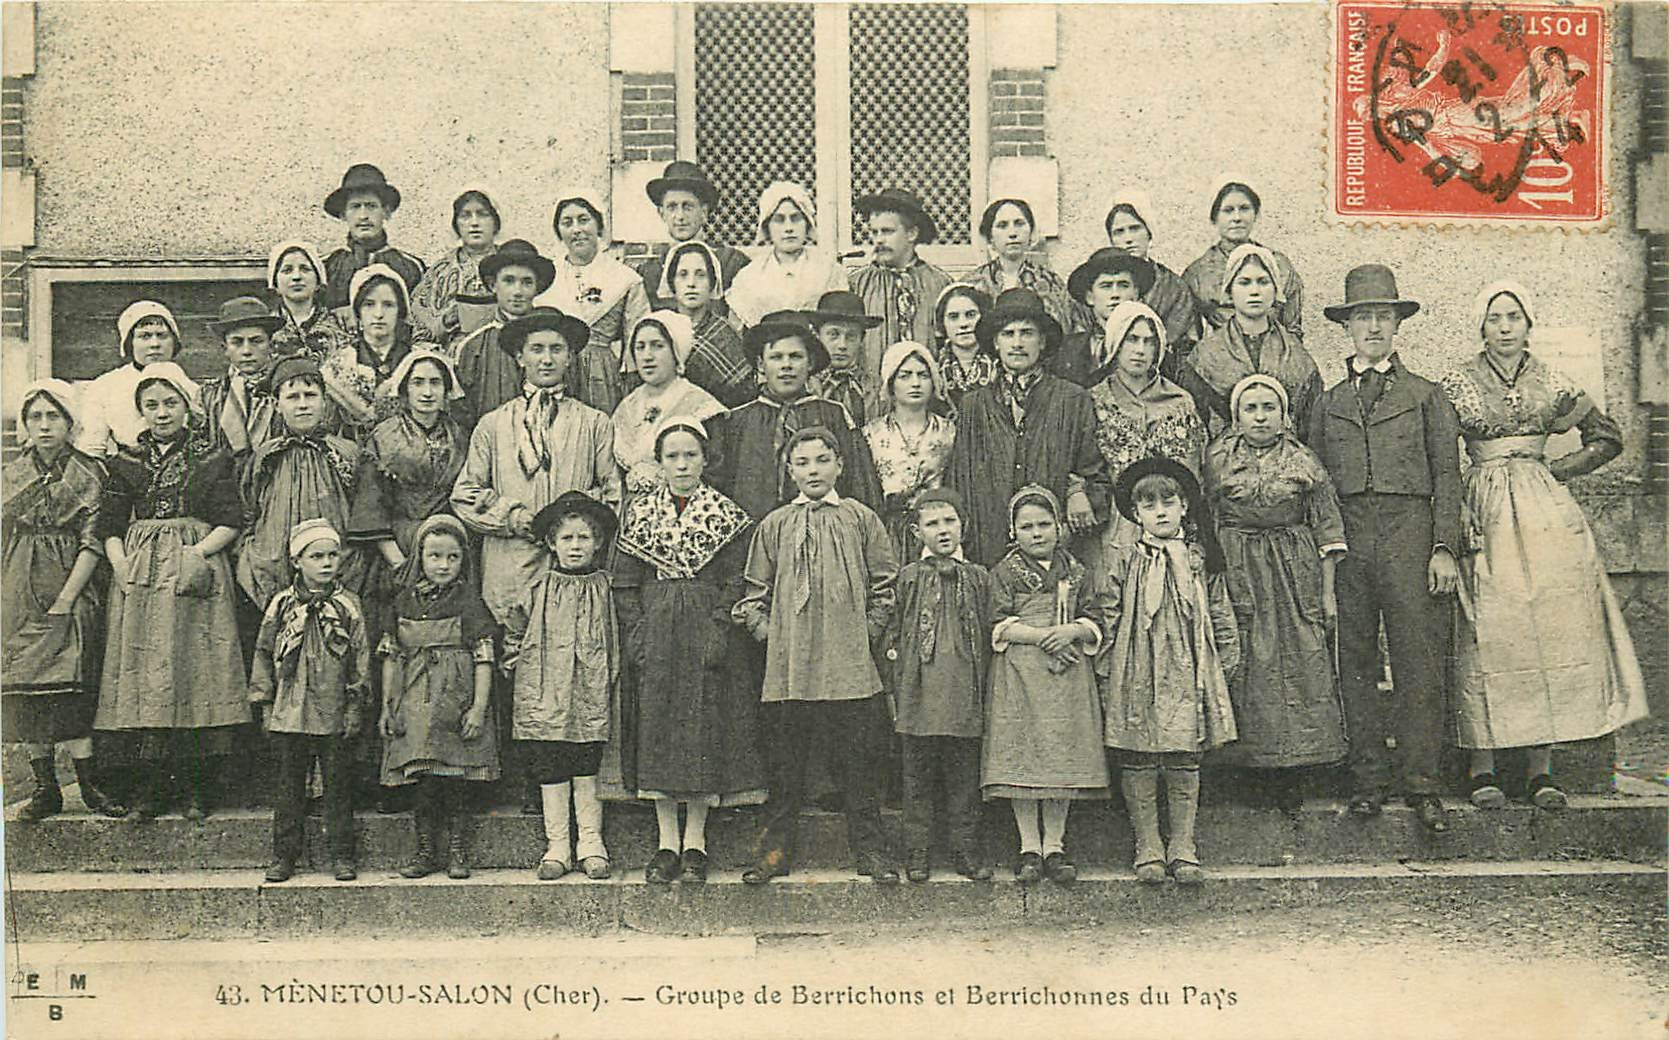 WW 18 MENETOU-SALON 1914 Berrichons folkloriques